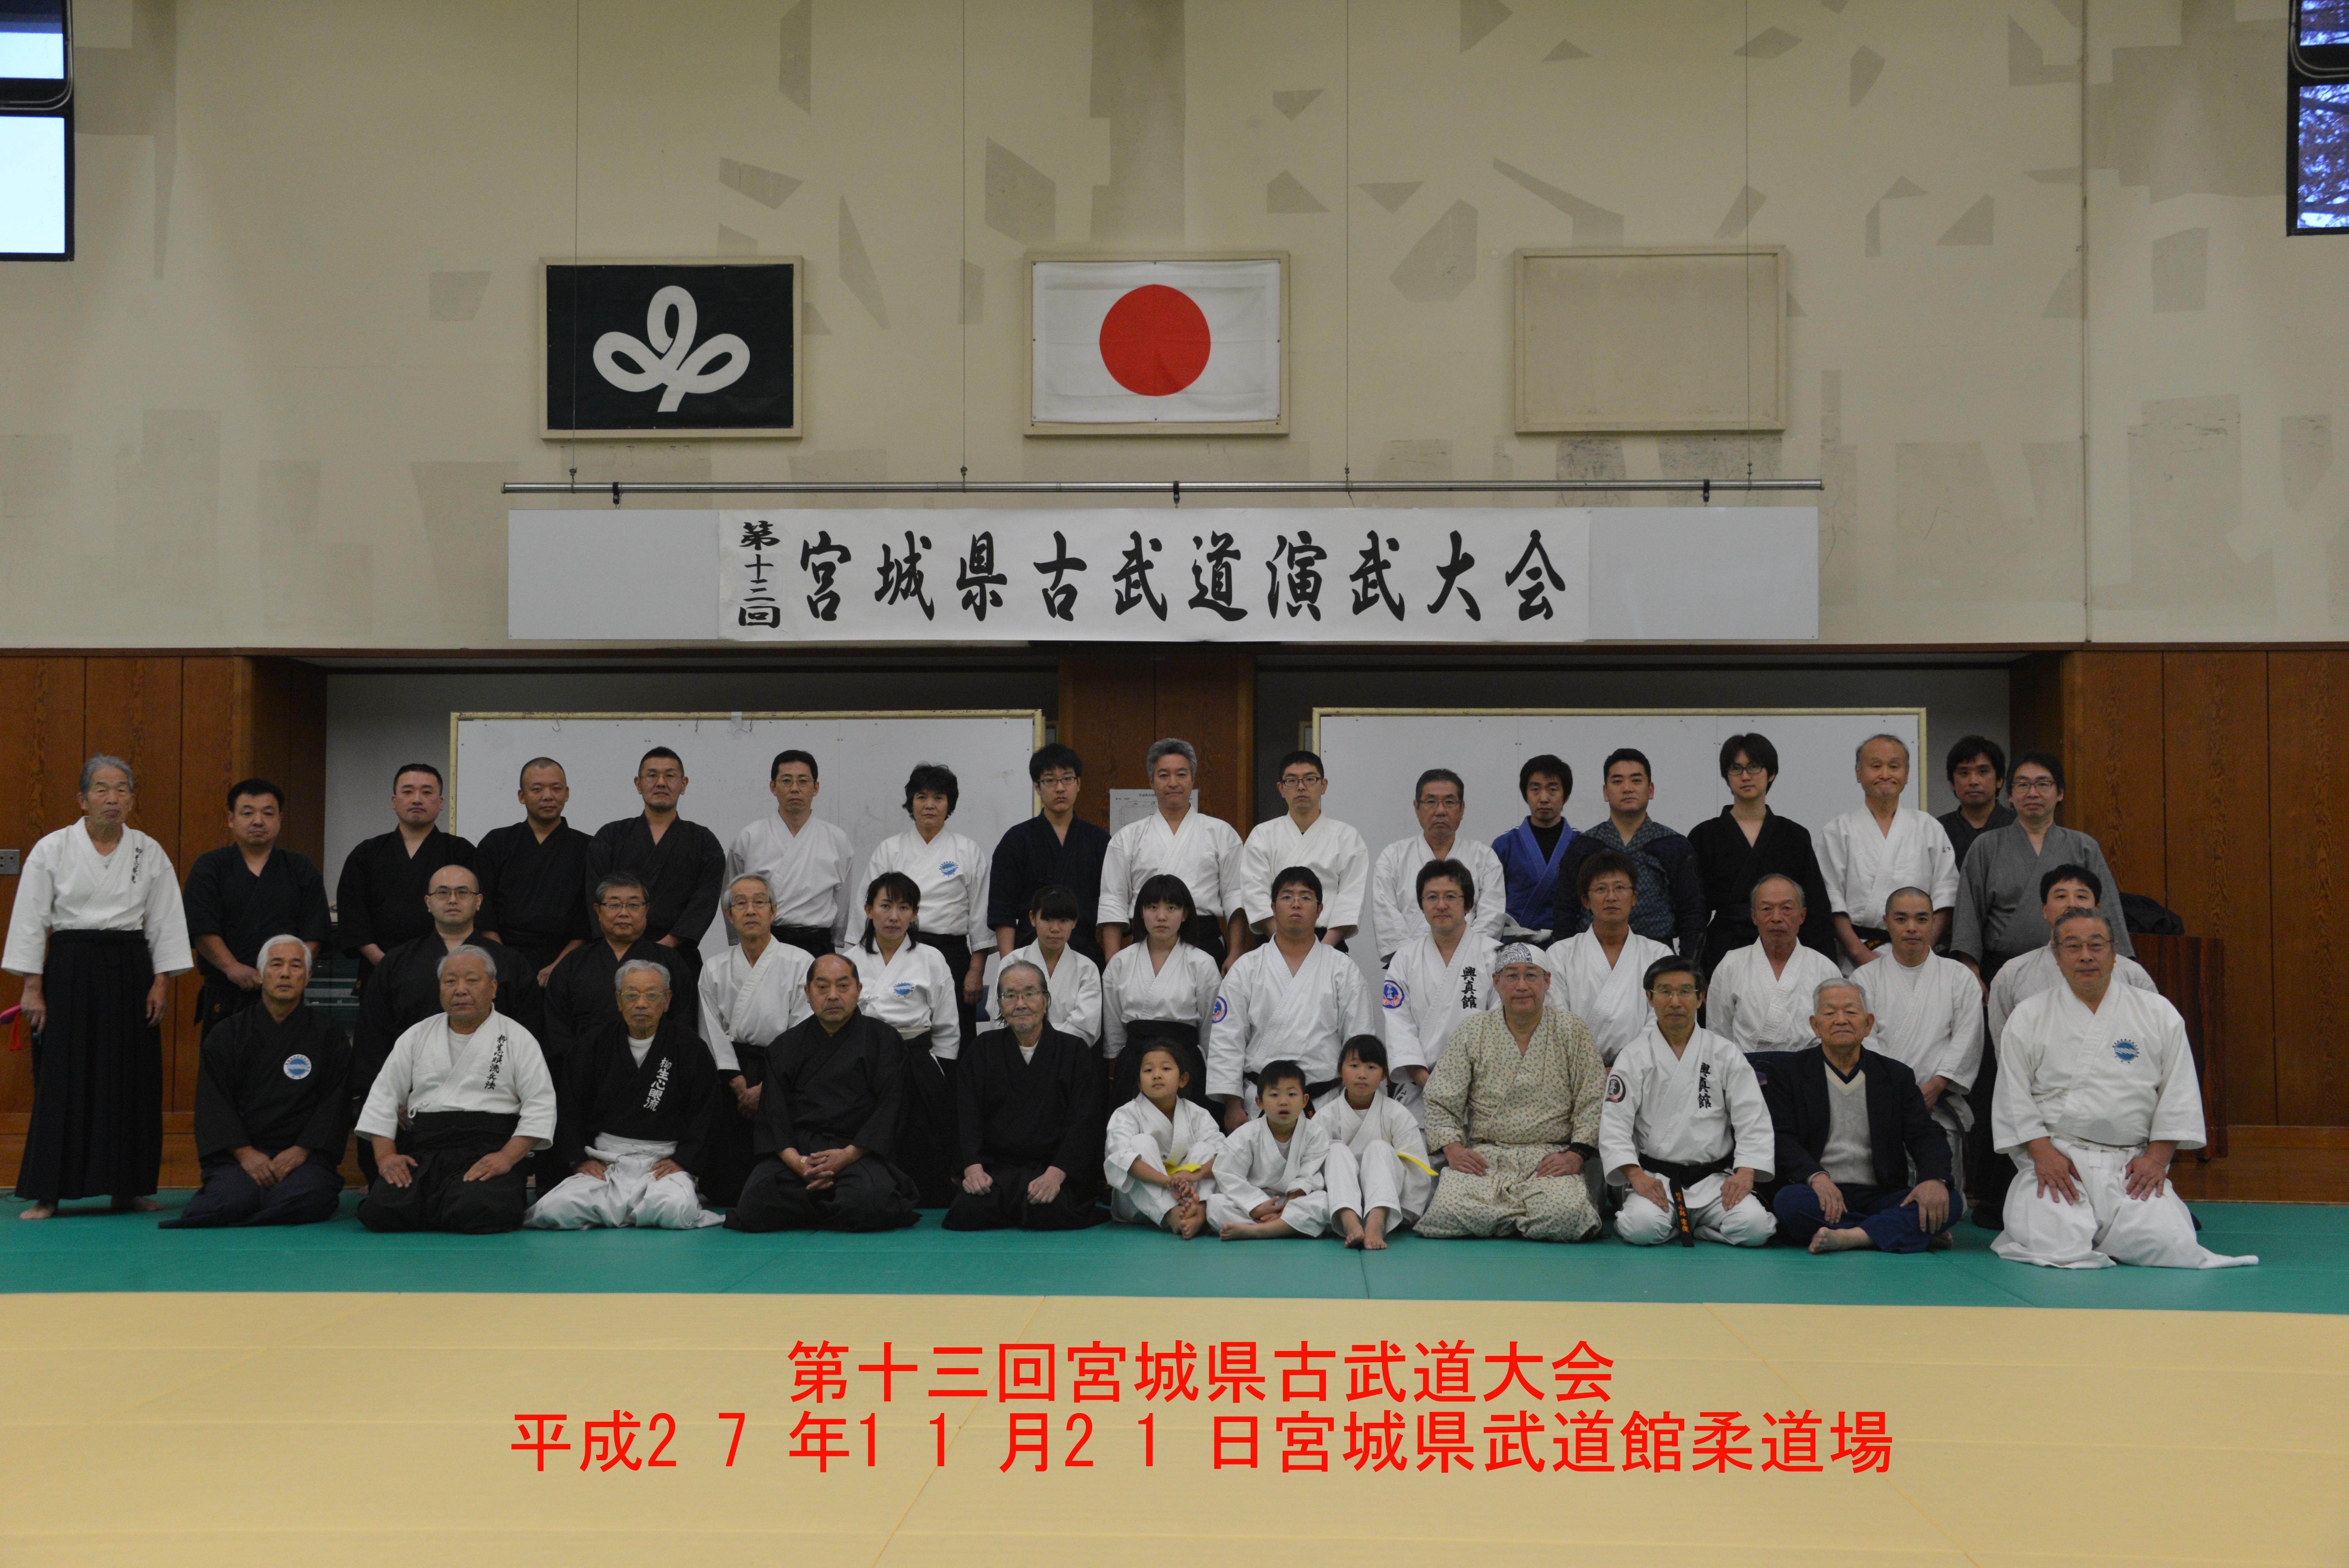 H27.11.21古武道大会